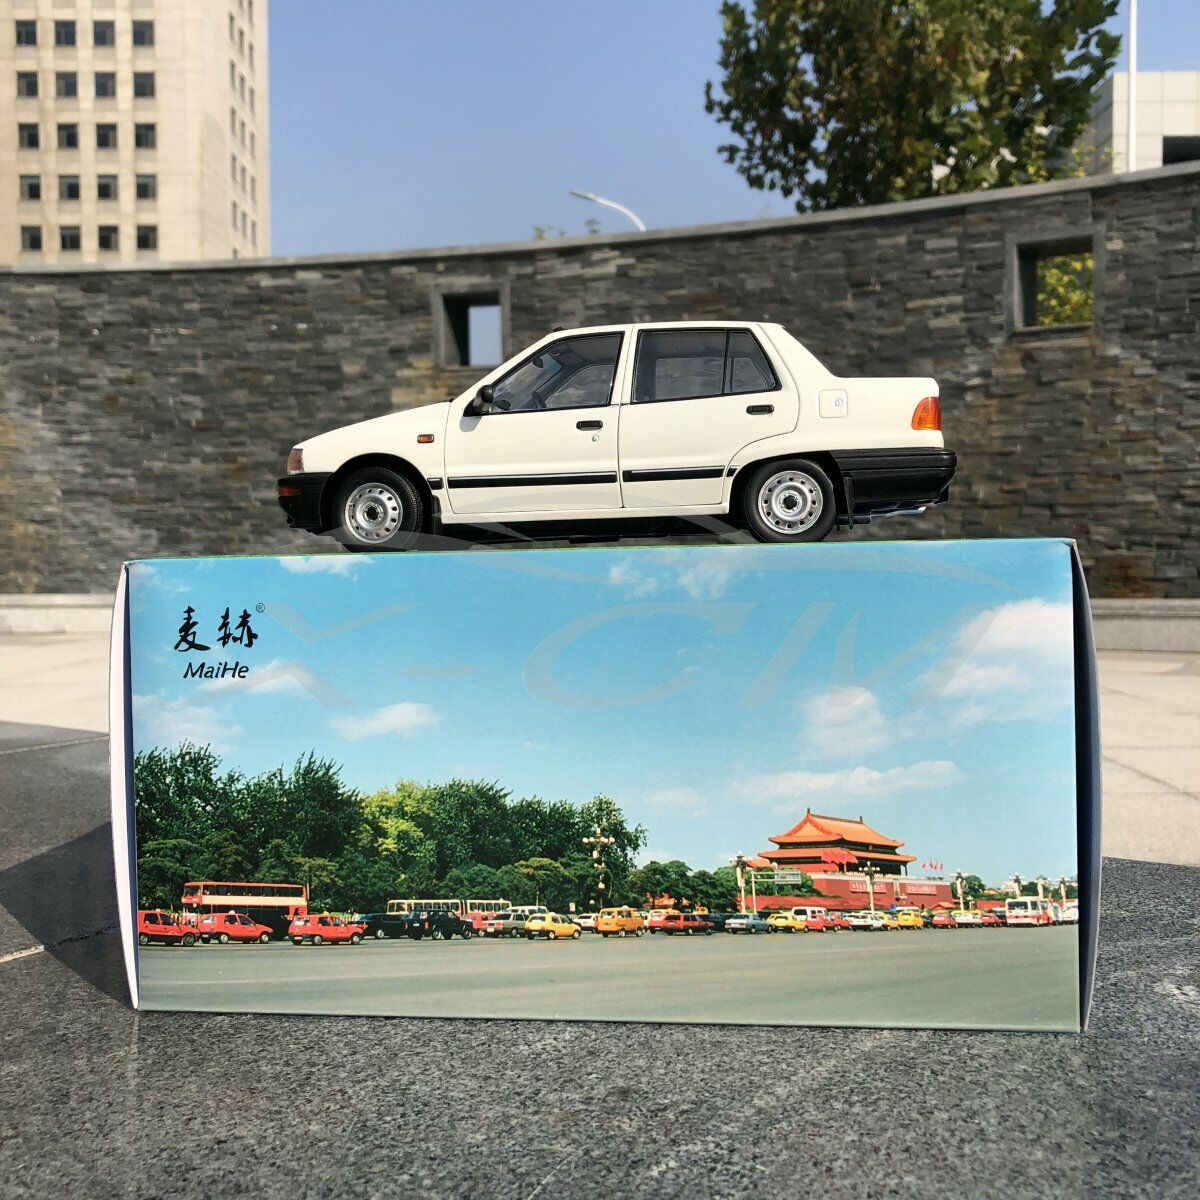 Modello AUTO DIECAST yiqi cinese Tianjin xiali TJ7100 Berlina 1 18 (bianco) + REGALO